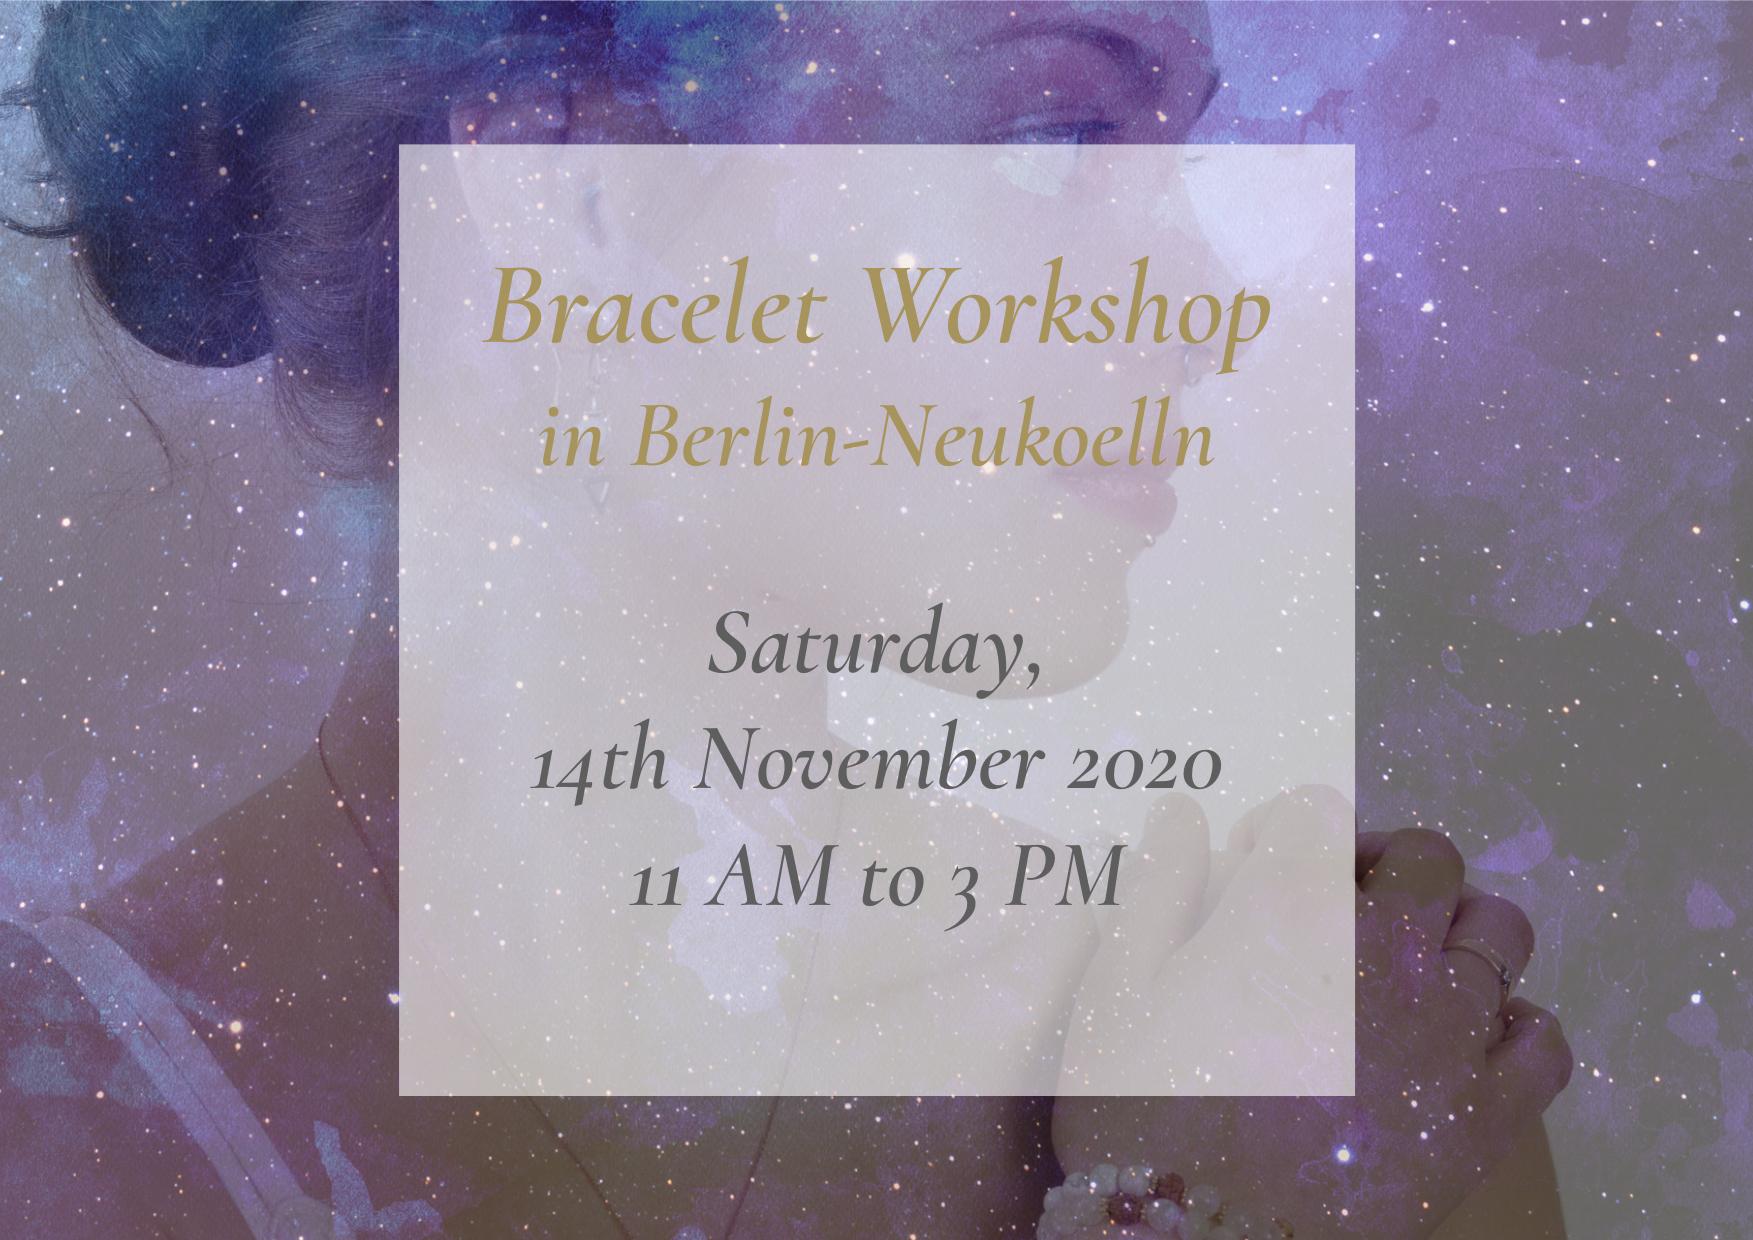 NW_Armband_WS_11_2020_Berlin_EN